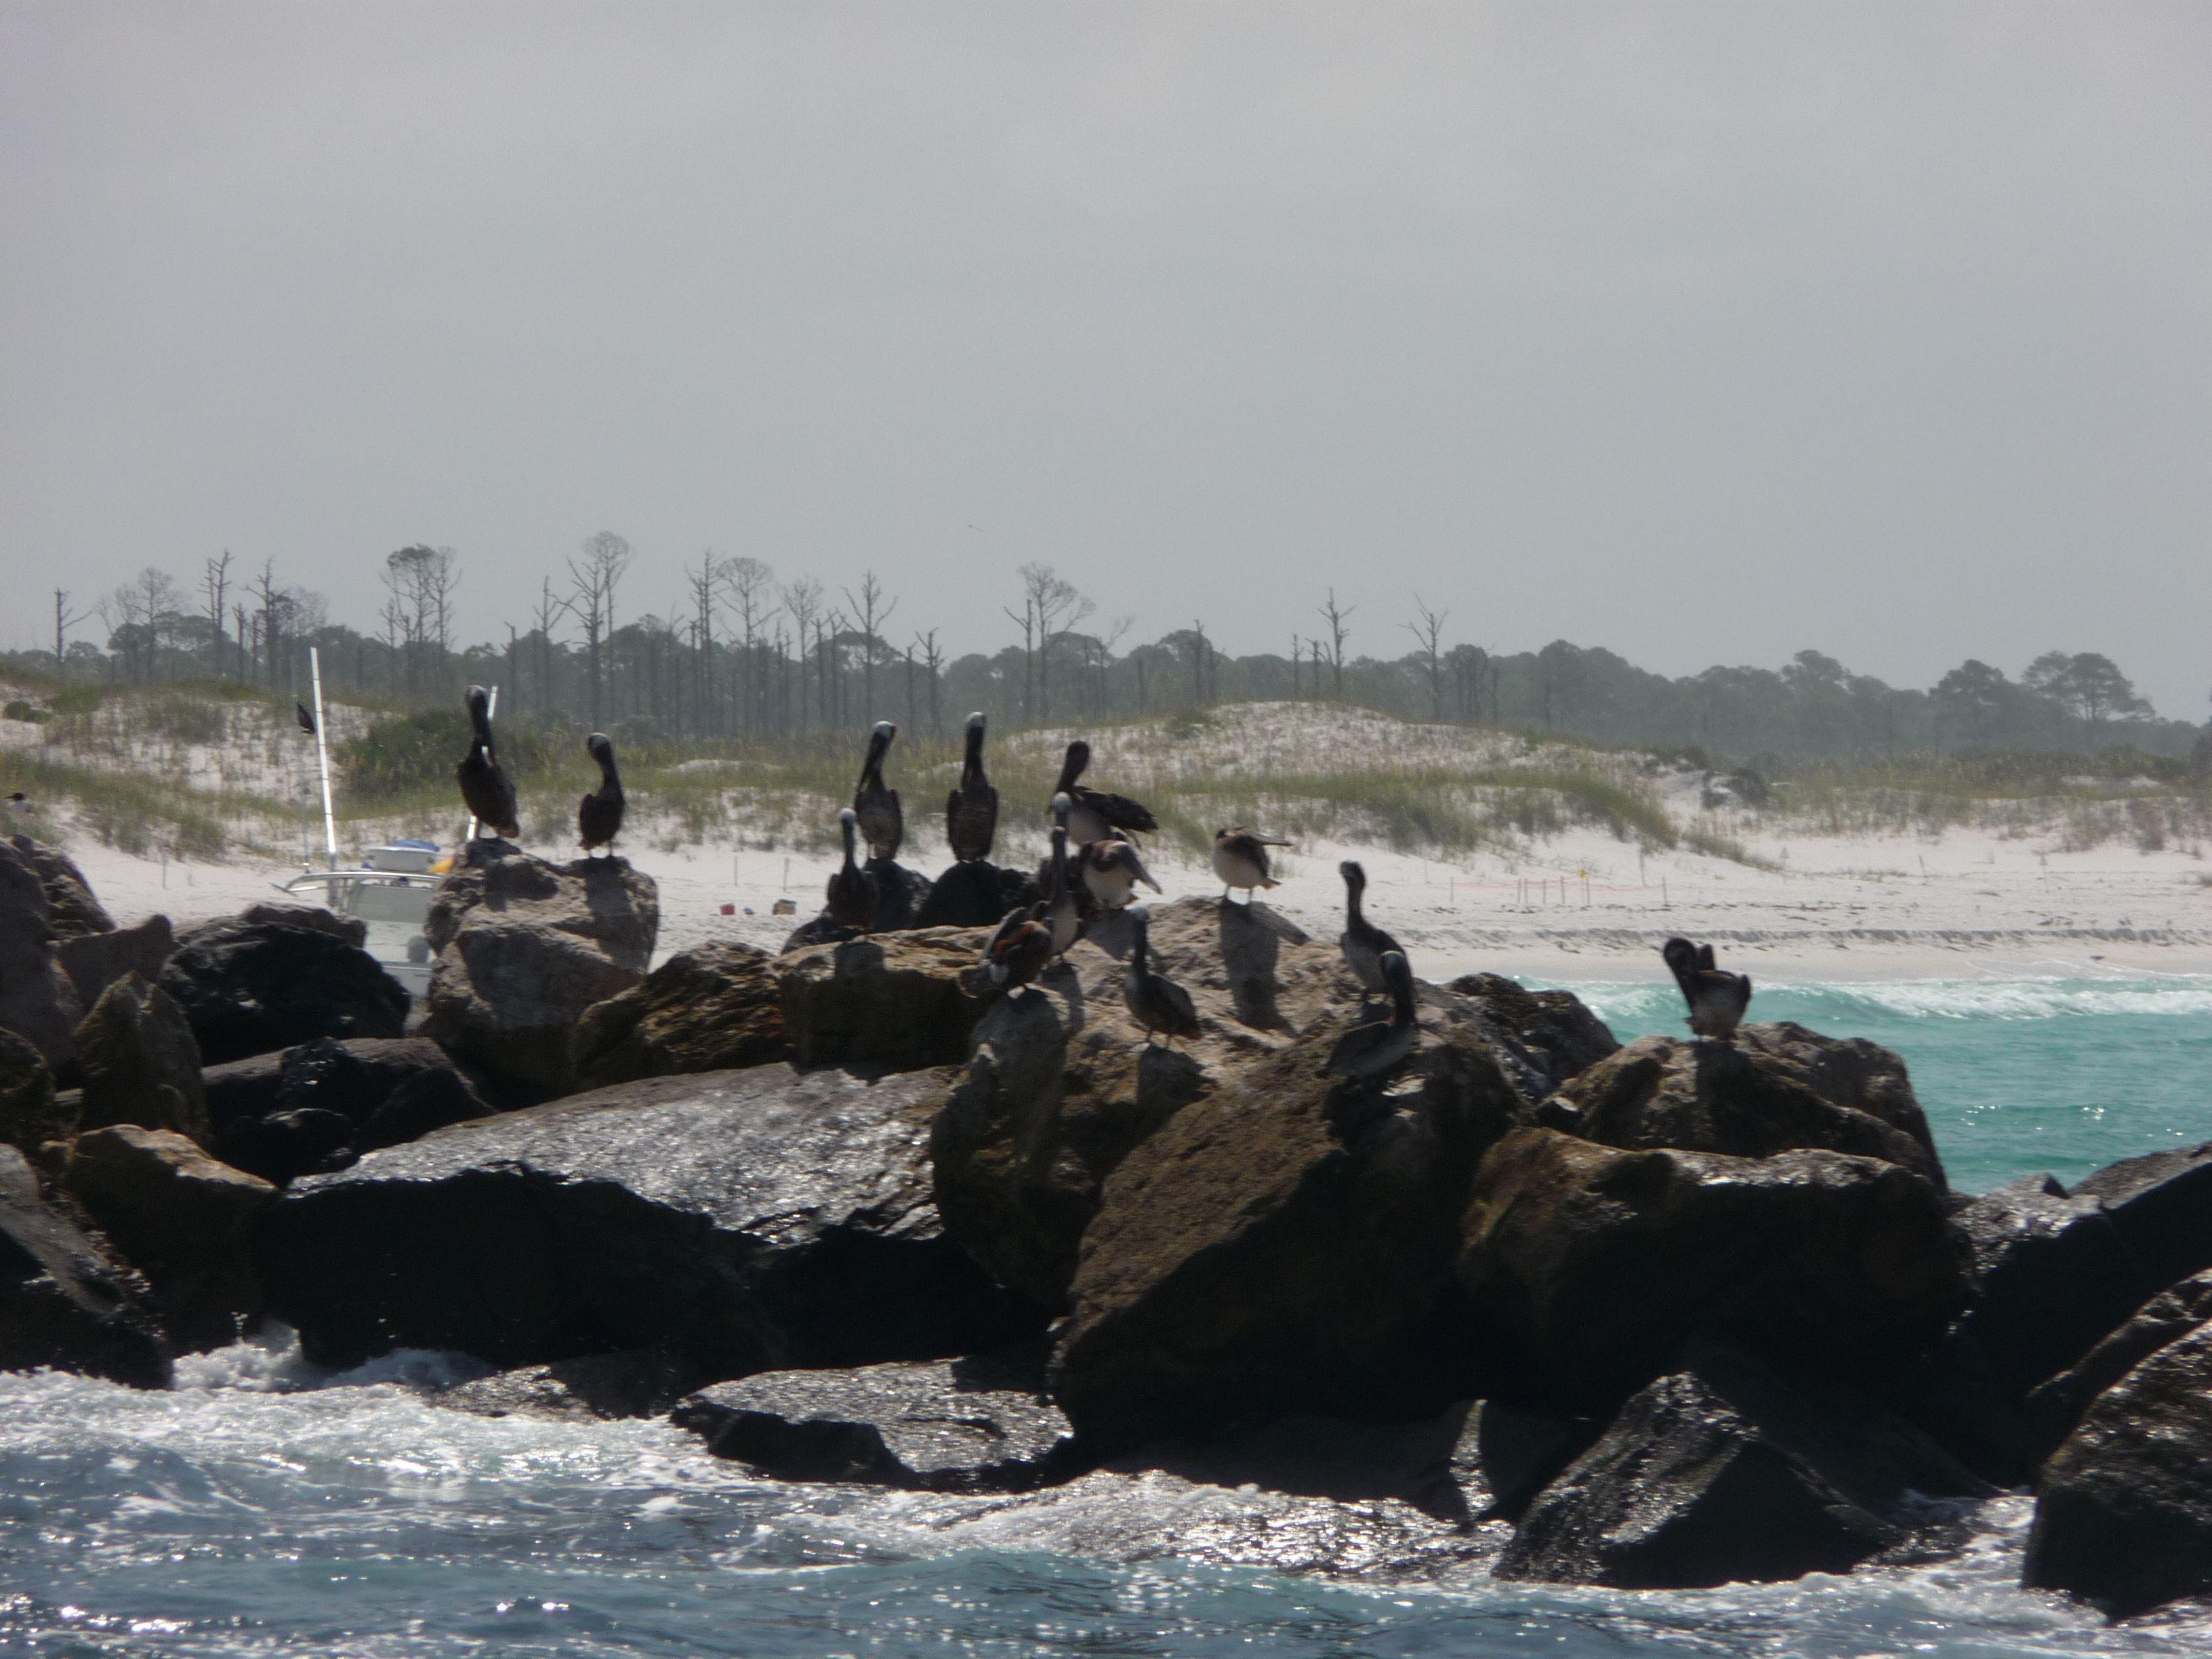 Off the coast of Panama City Beach, FL  photo by Jennifer Kirby